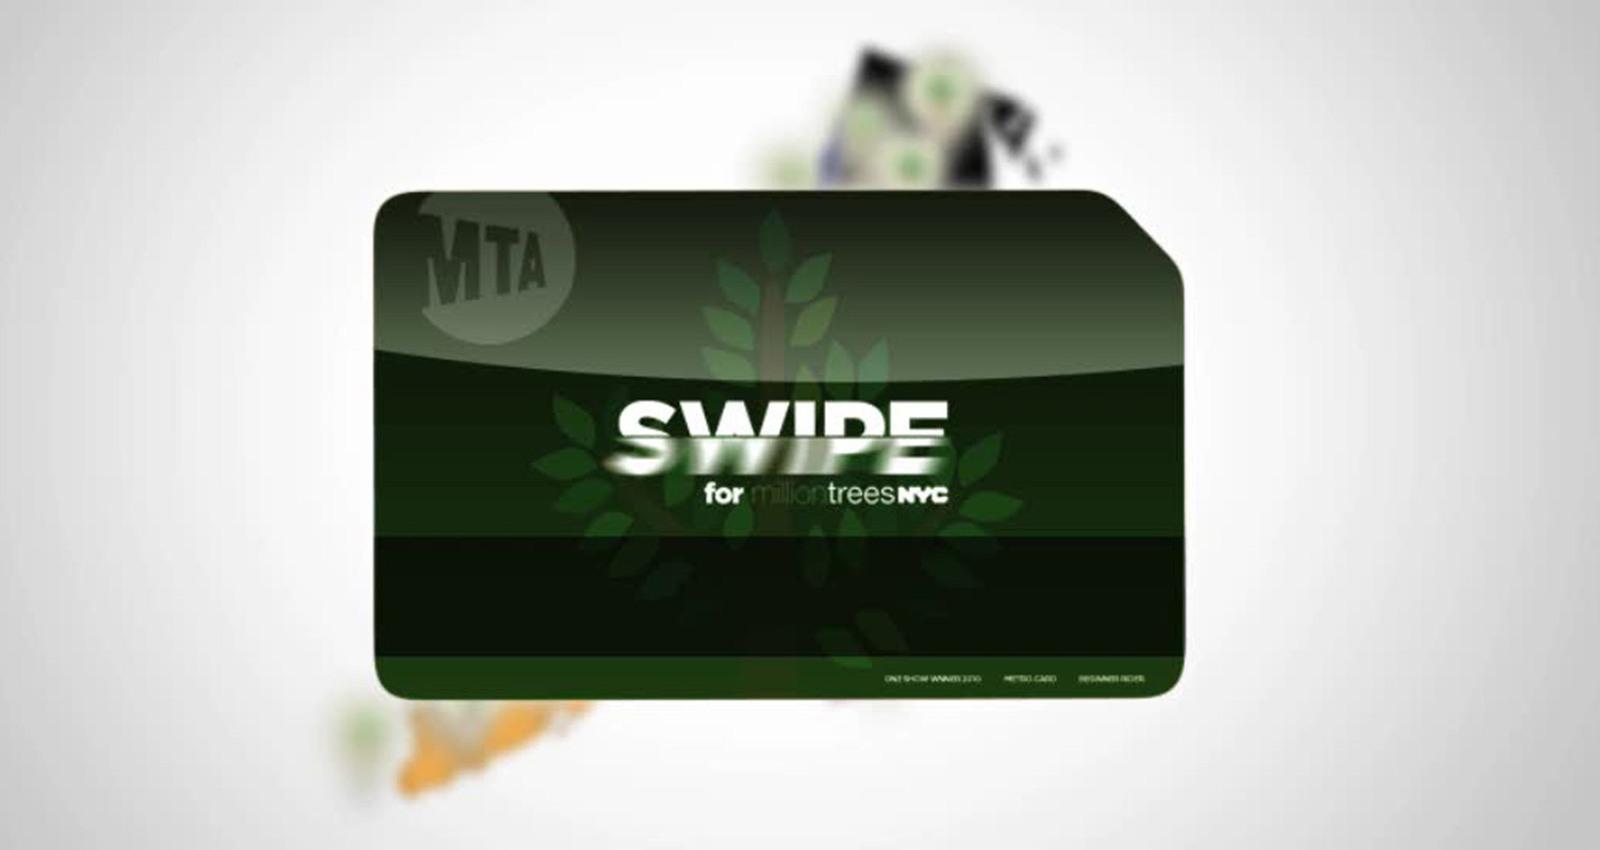 SWIPE for a Million Trees